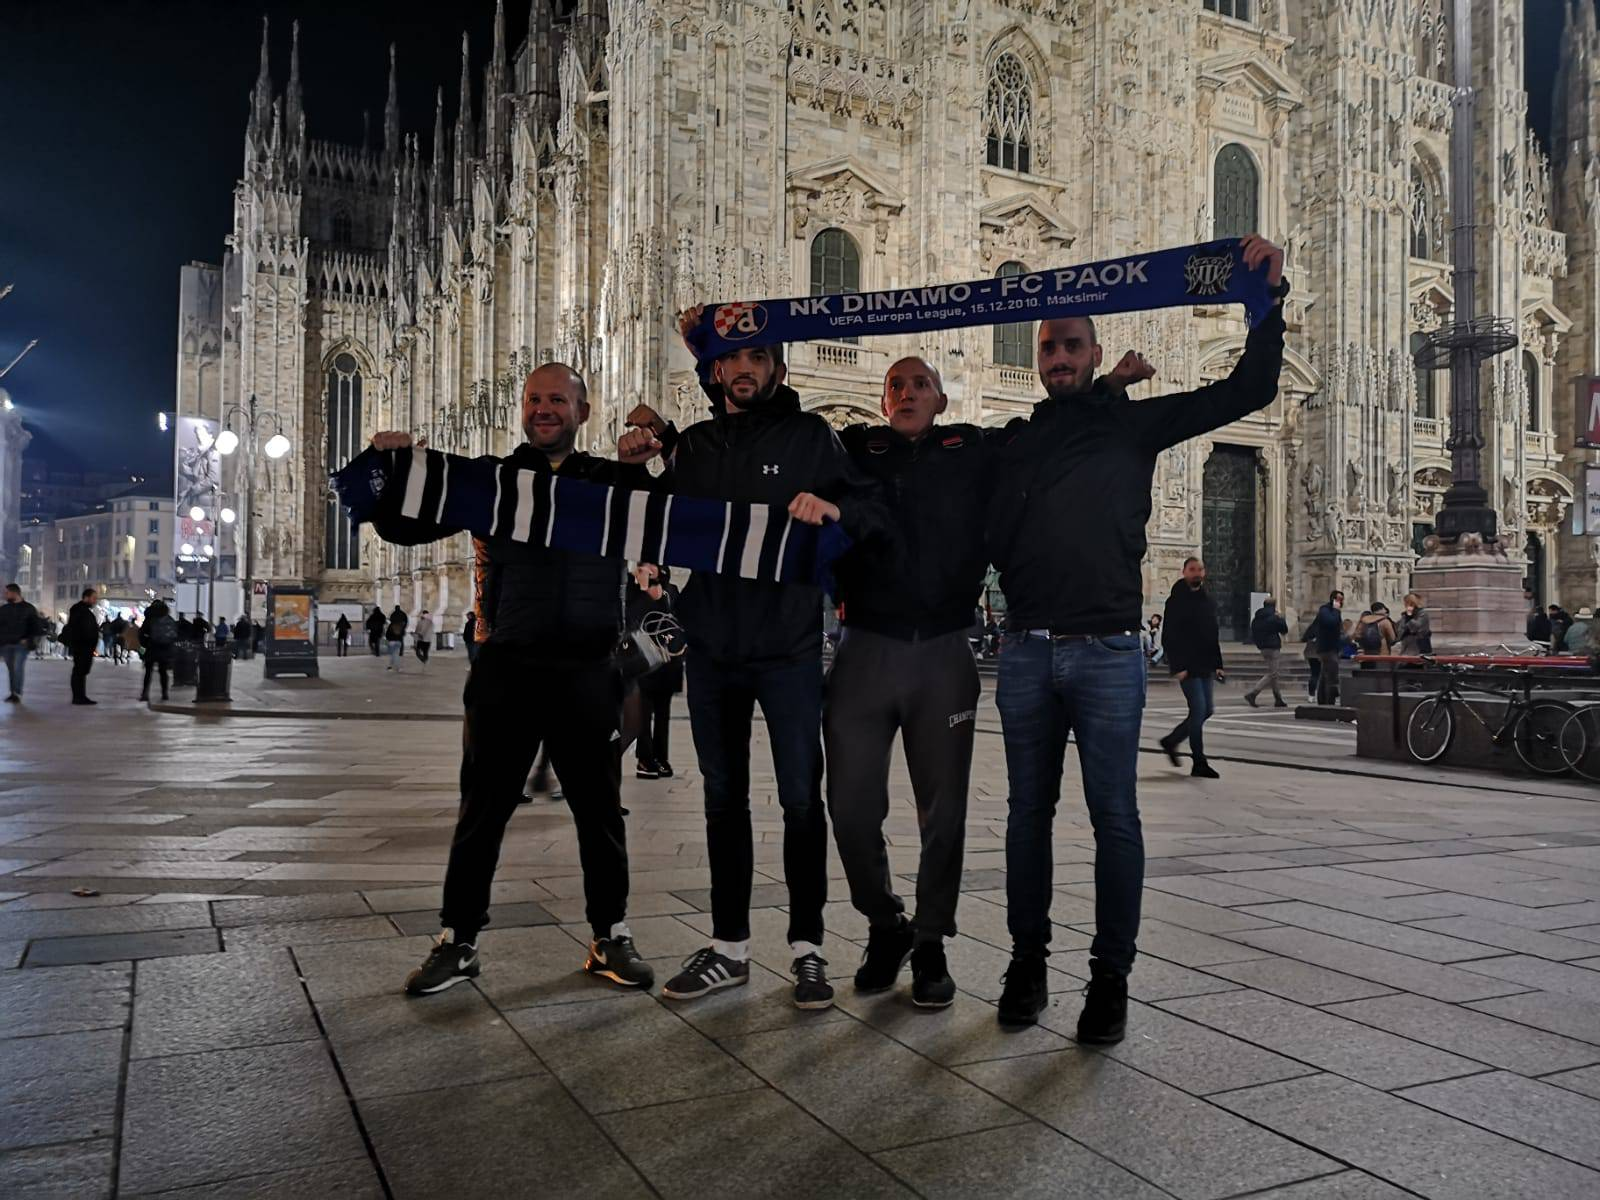 Bad Blue Boysi kasno navečer počeli stizati na Piazzu Duomo